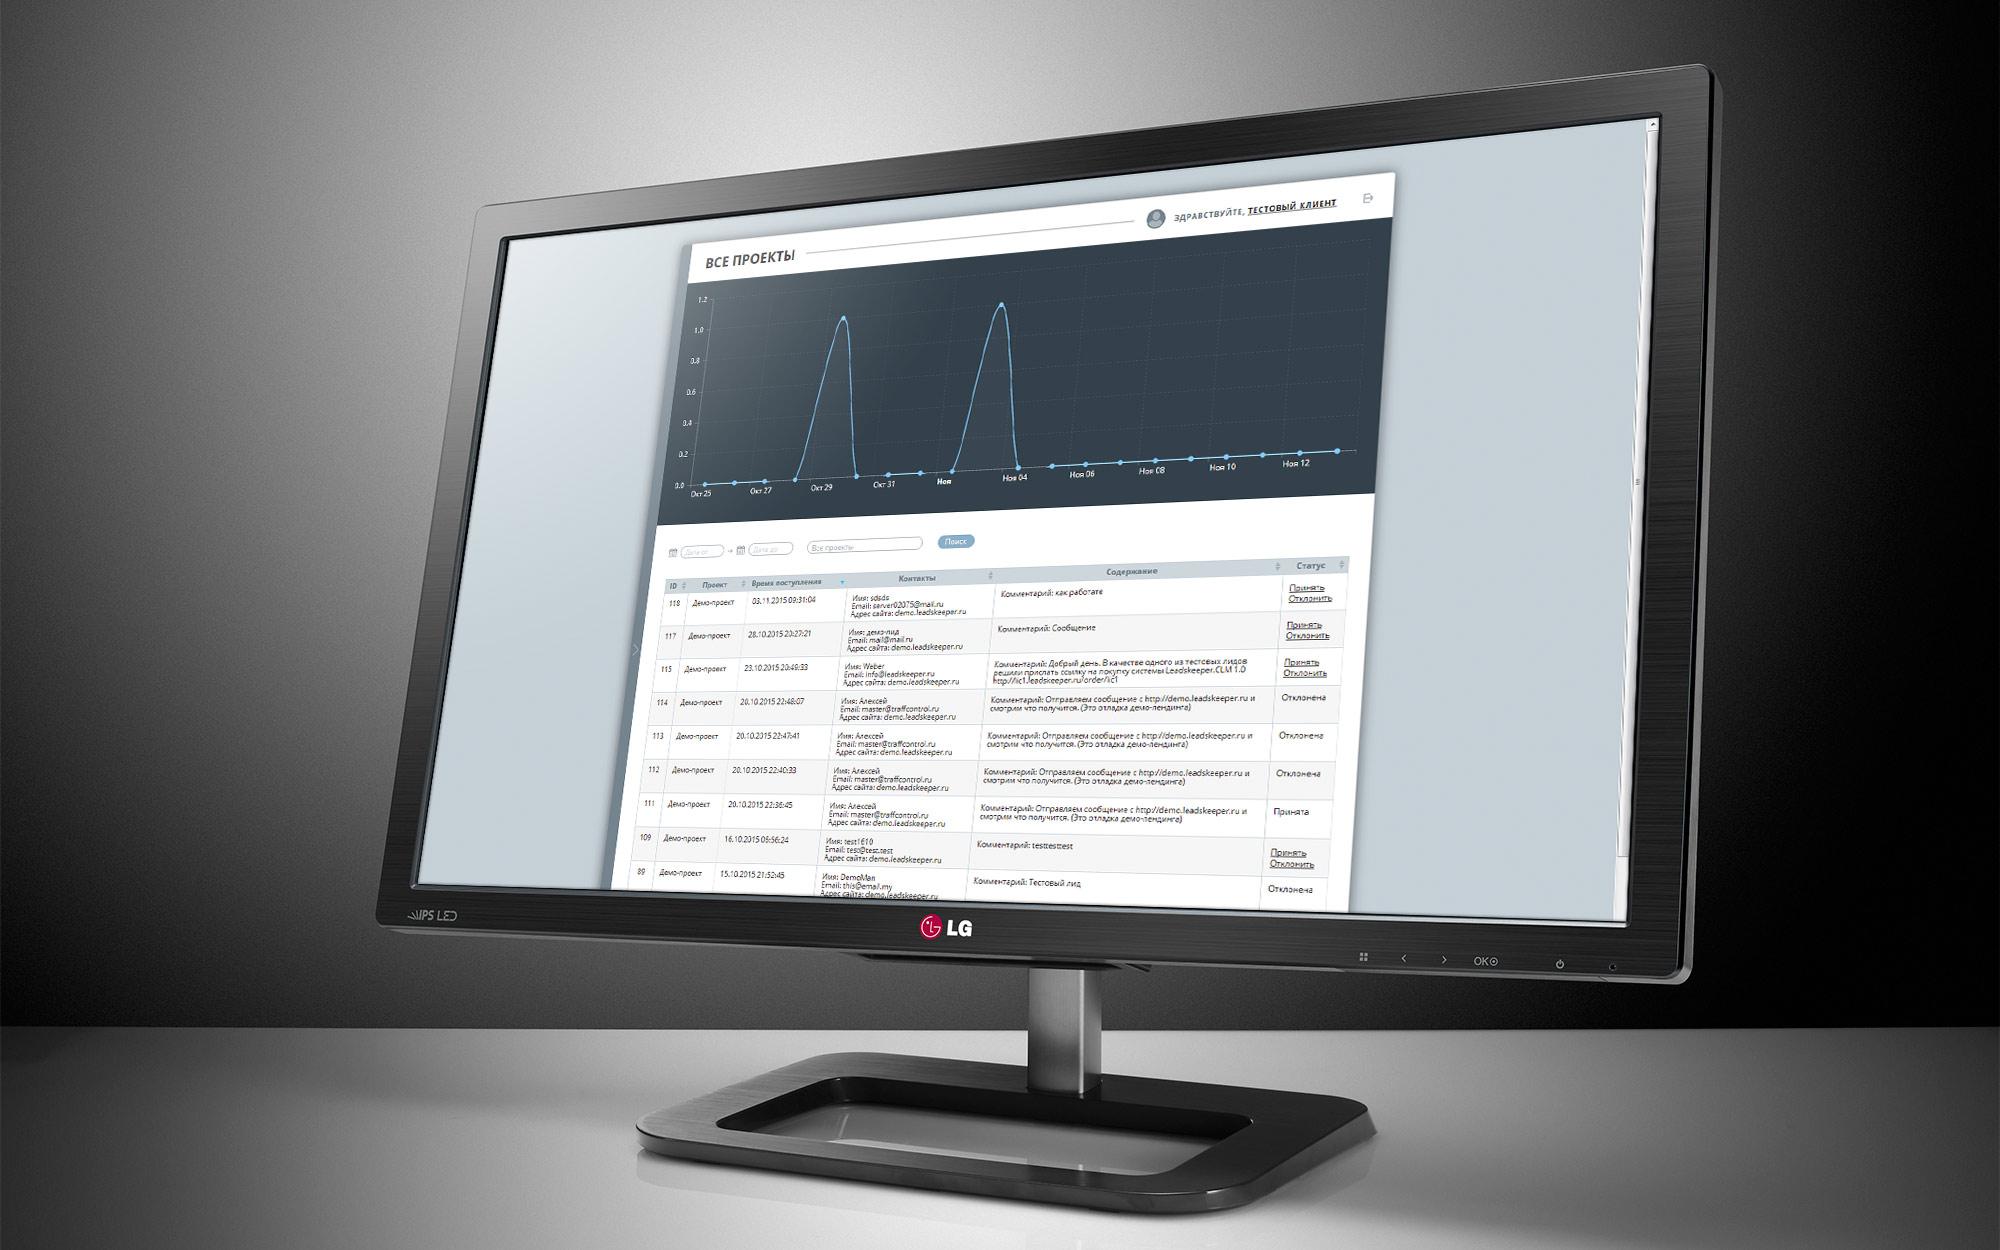 Проект LeadsKeeper - вся правда, отзыв о работе проекта